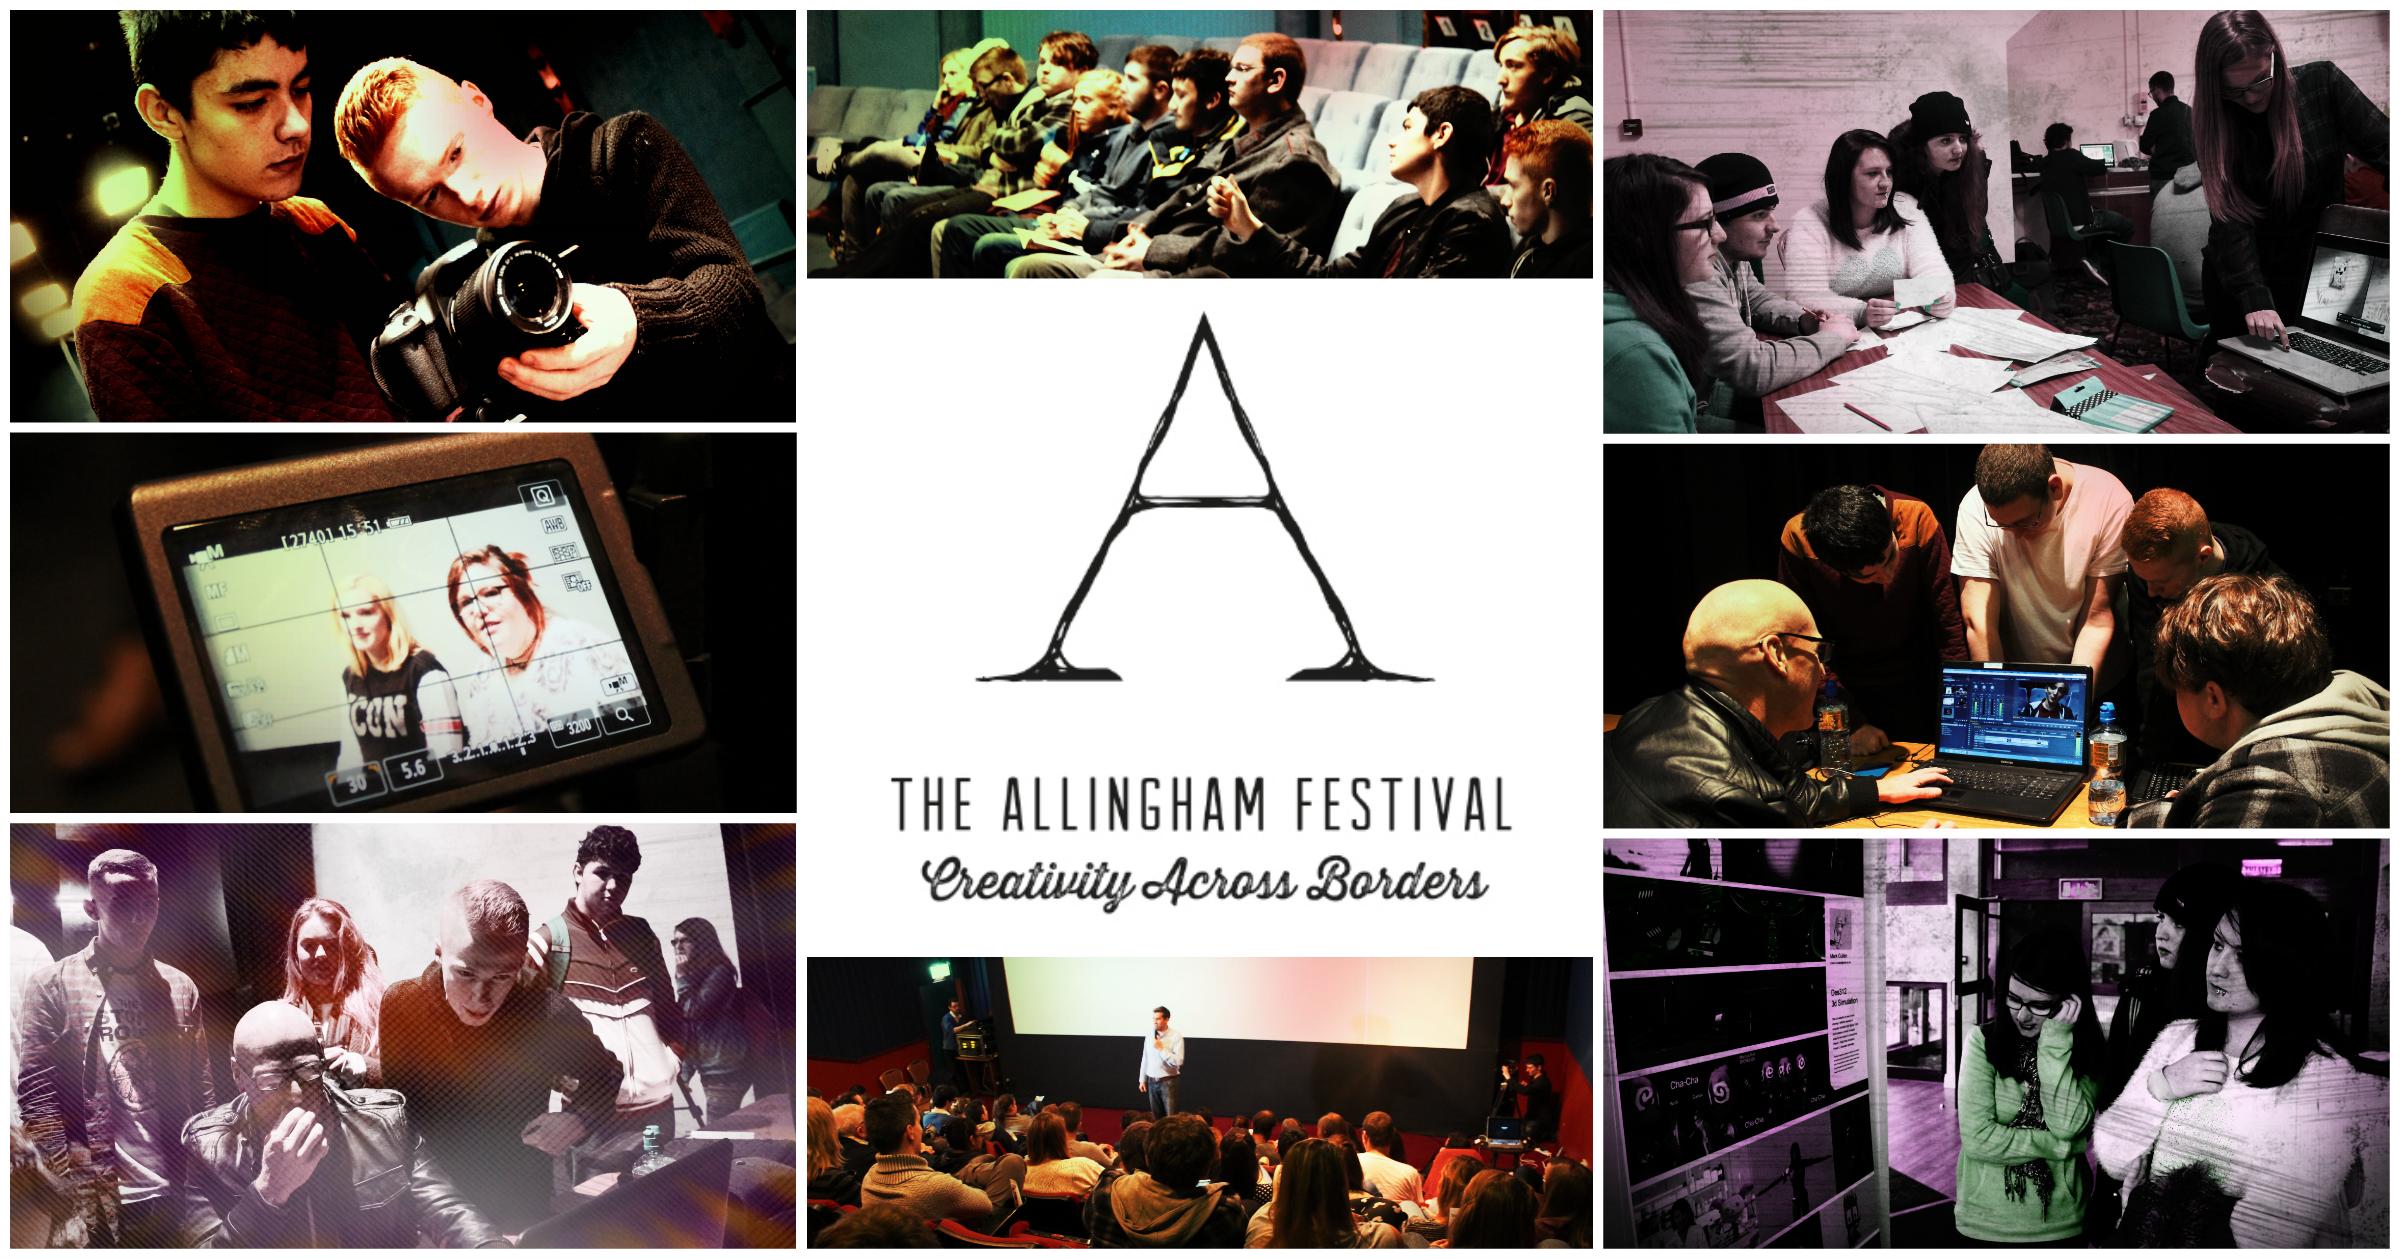 Allinghamfestivalnwrcstudents.png